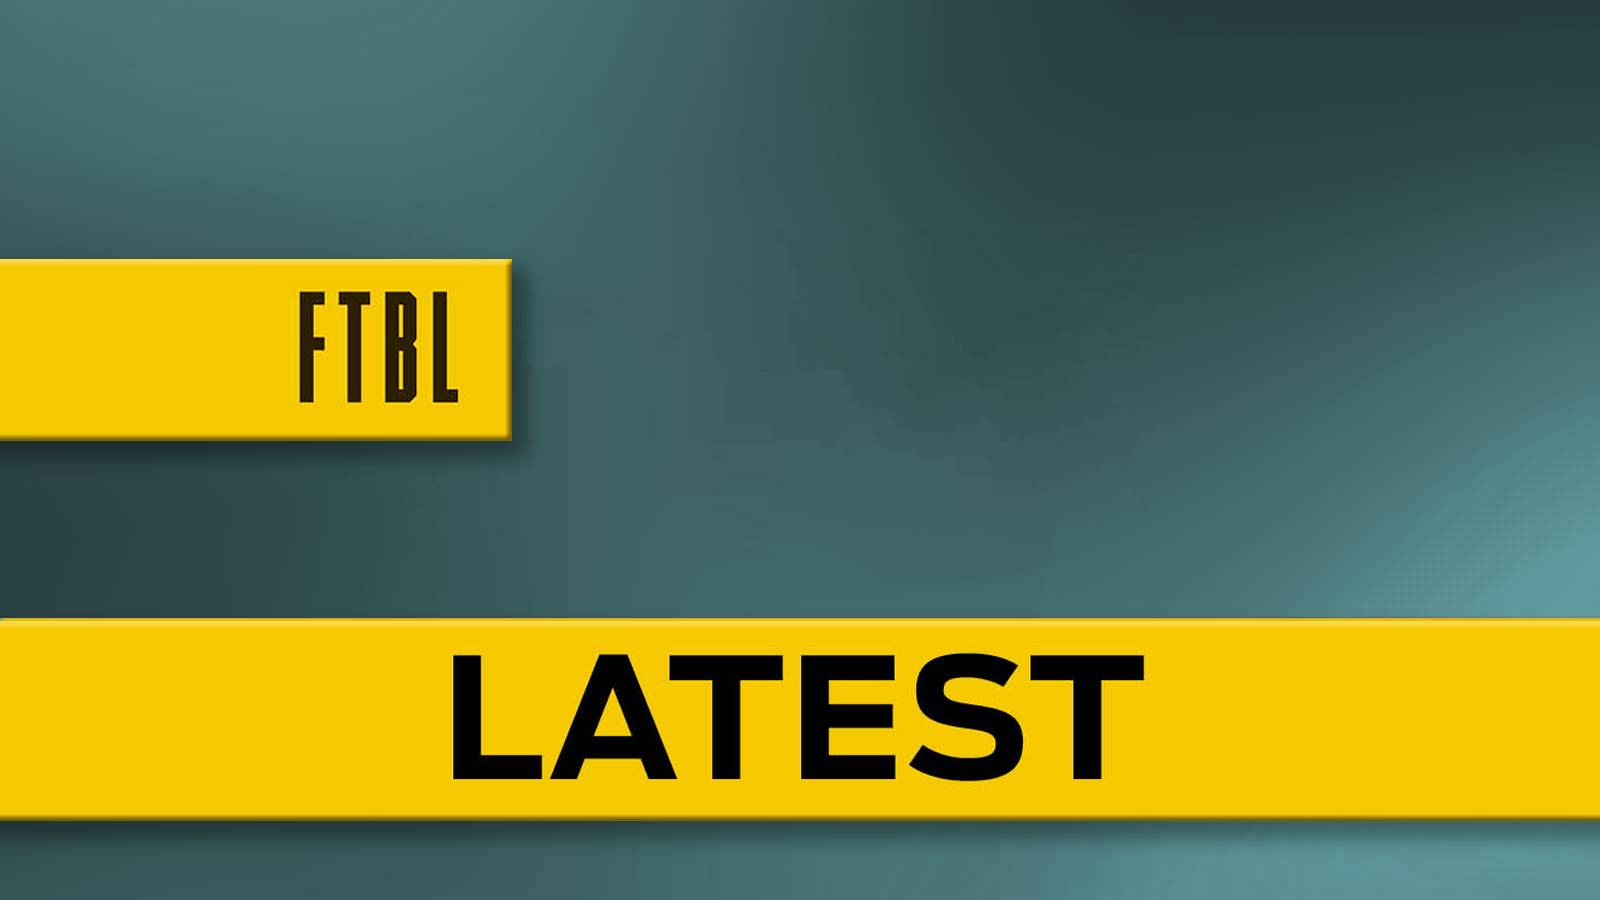 Glory defender Neville exits, Roar touted